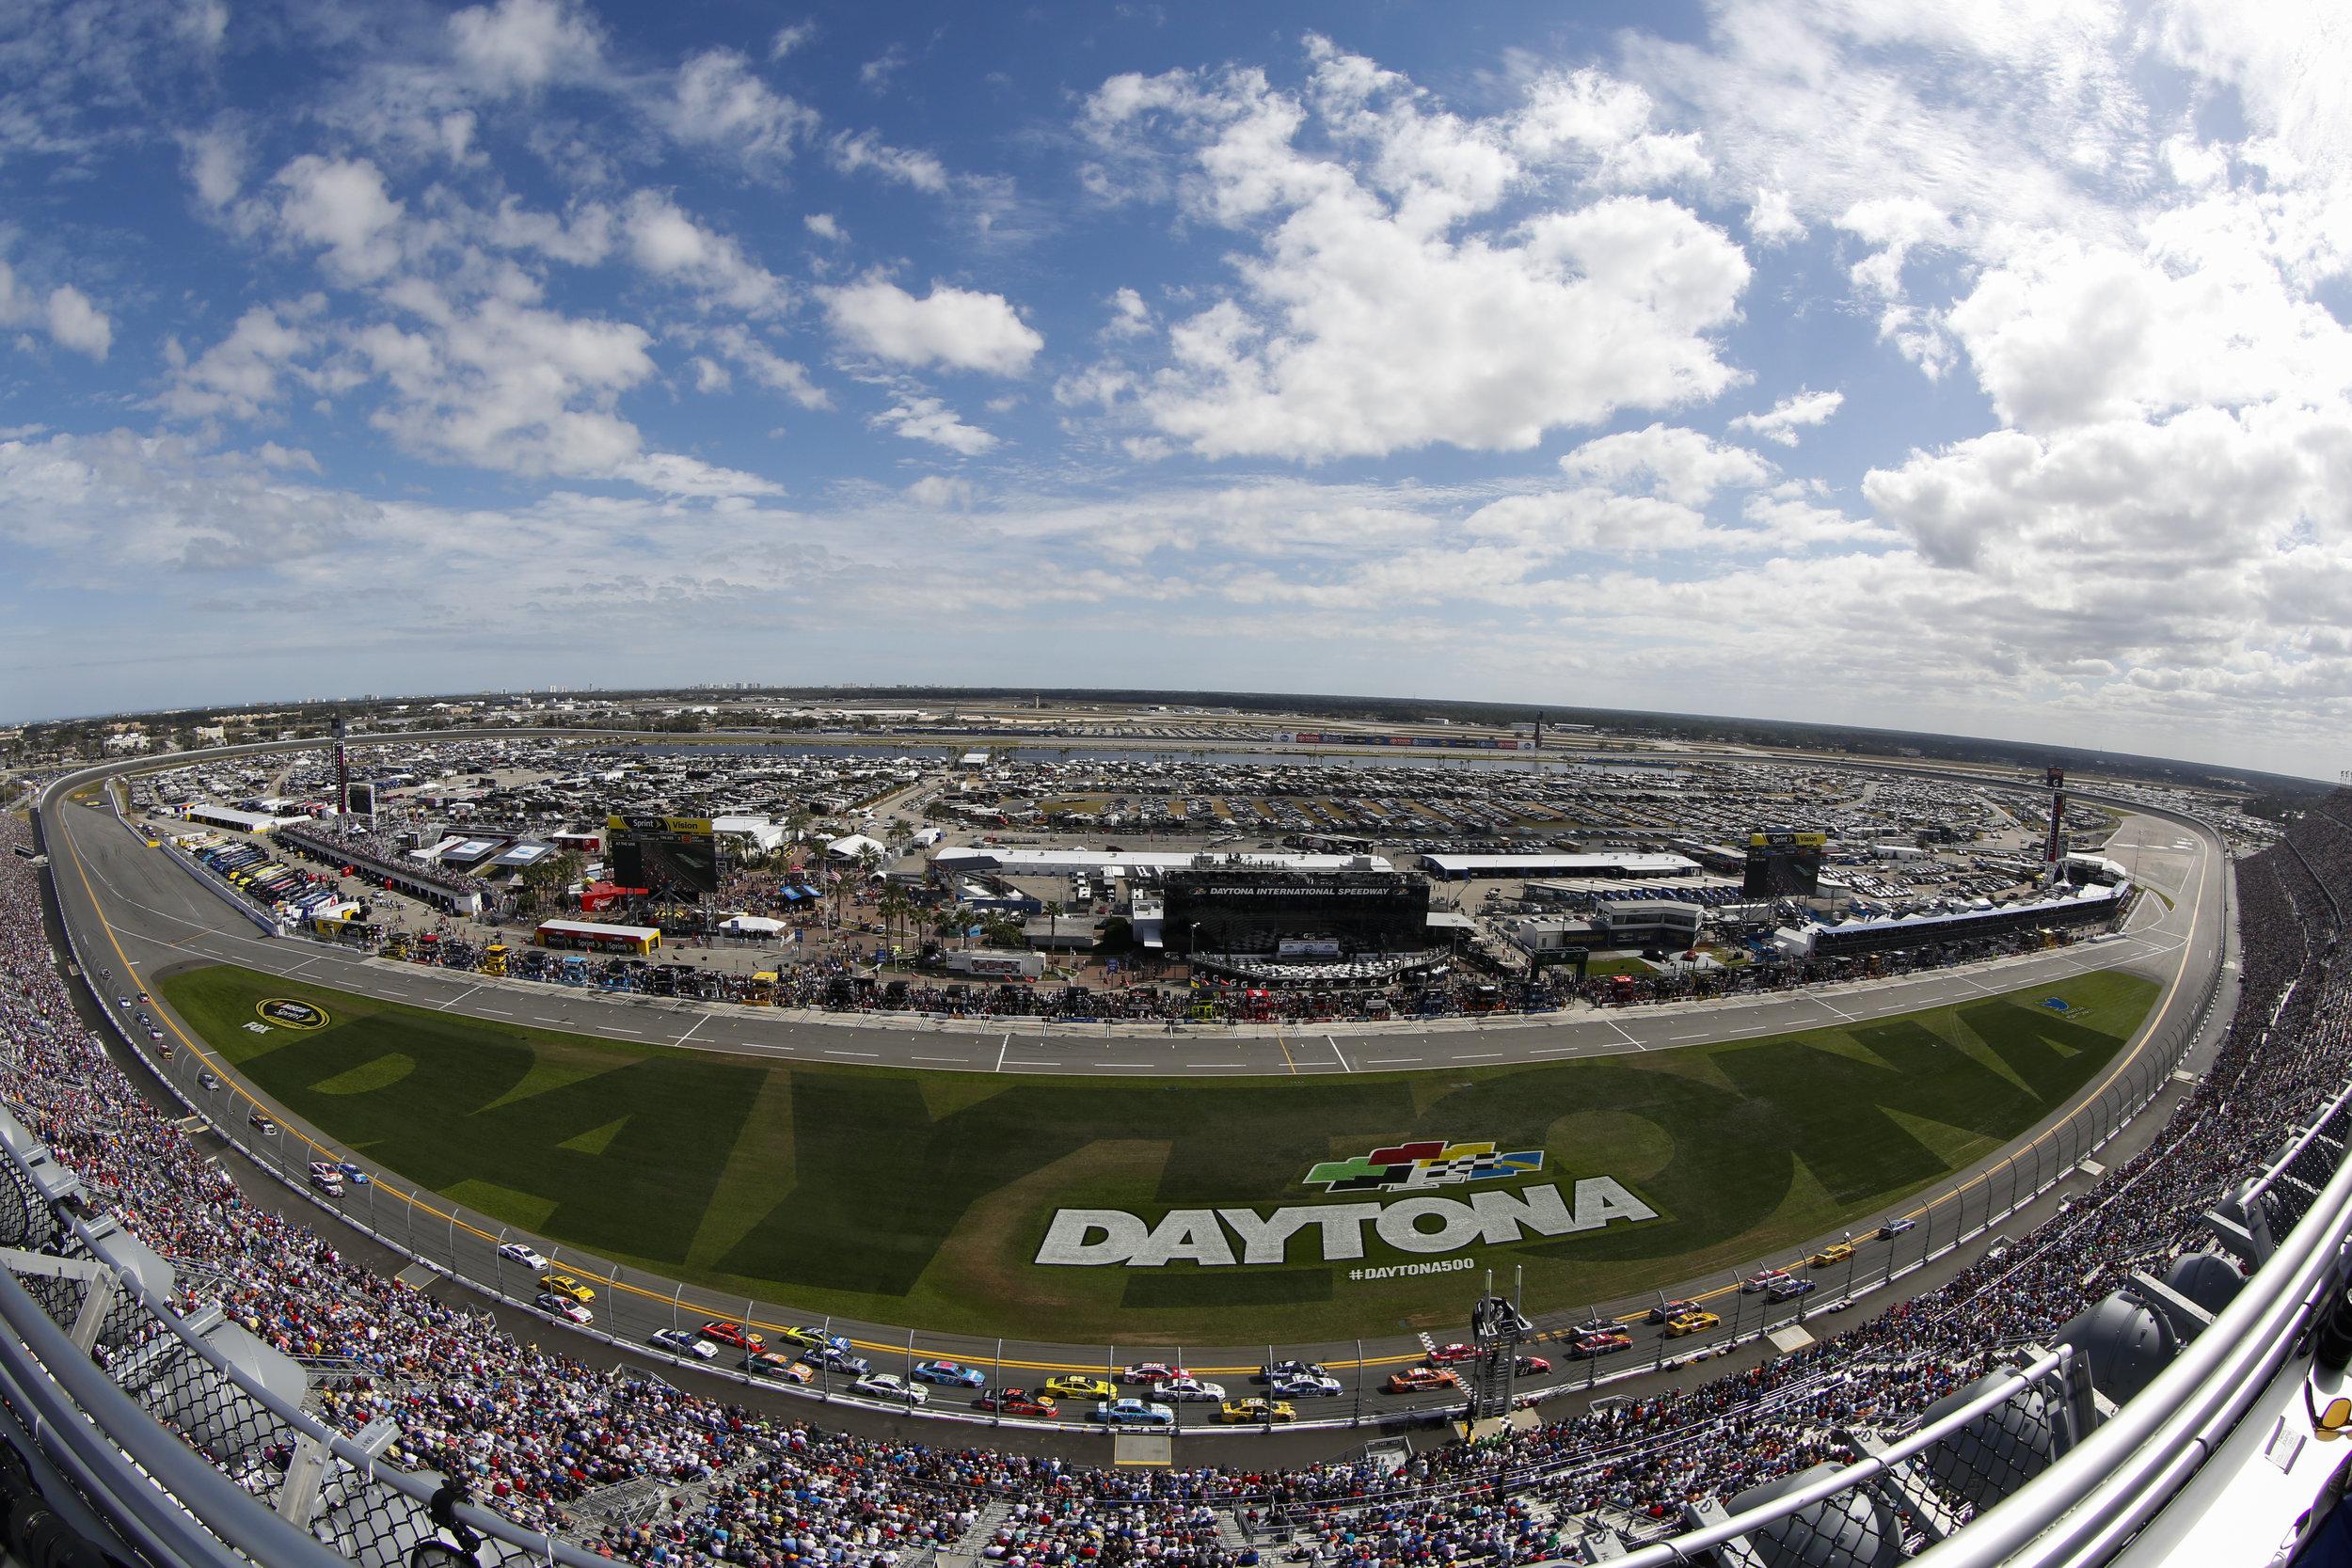 Daytona _ Grass.jpg